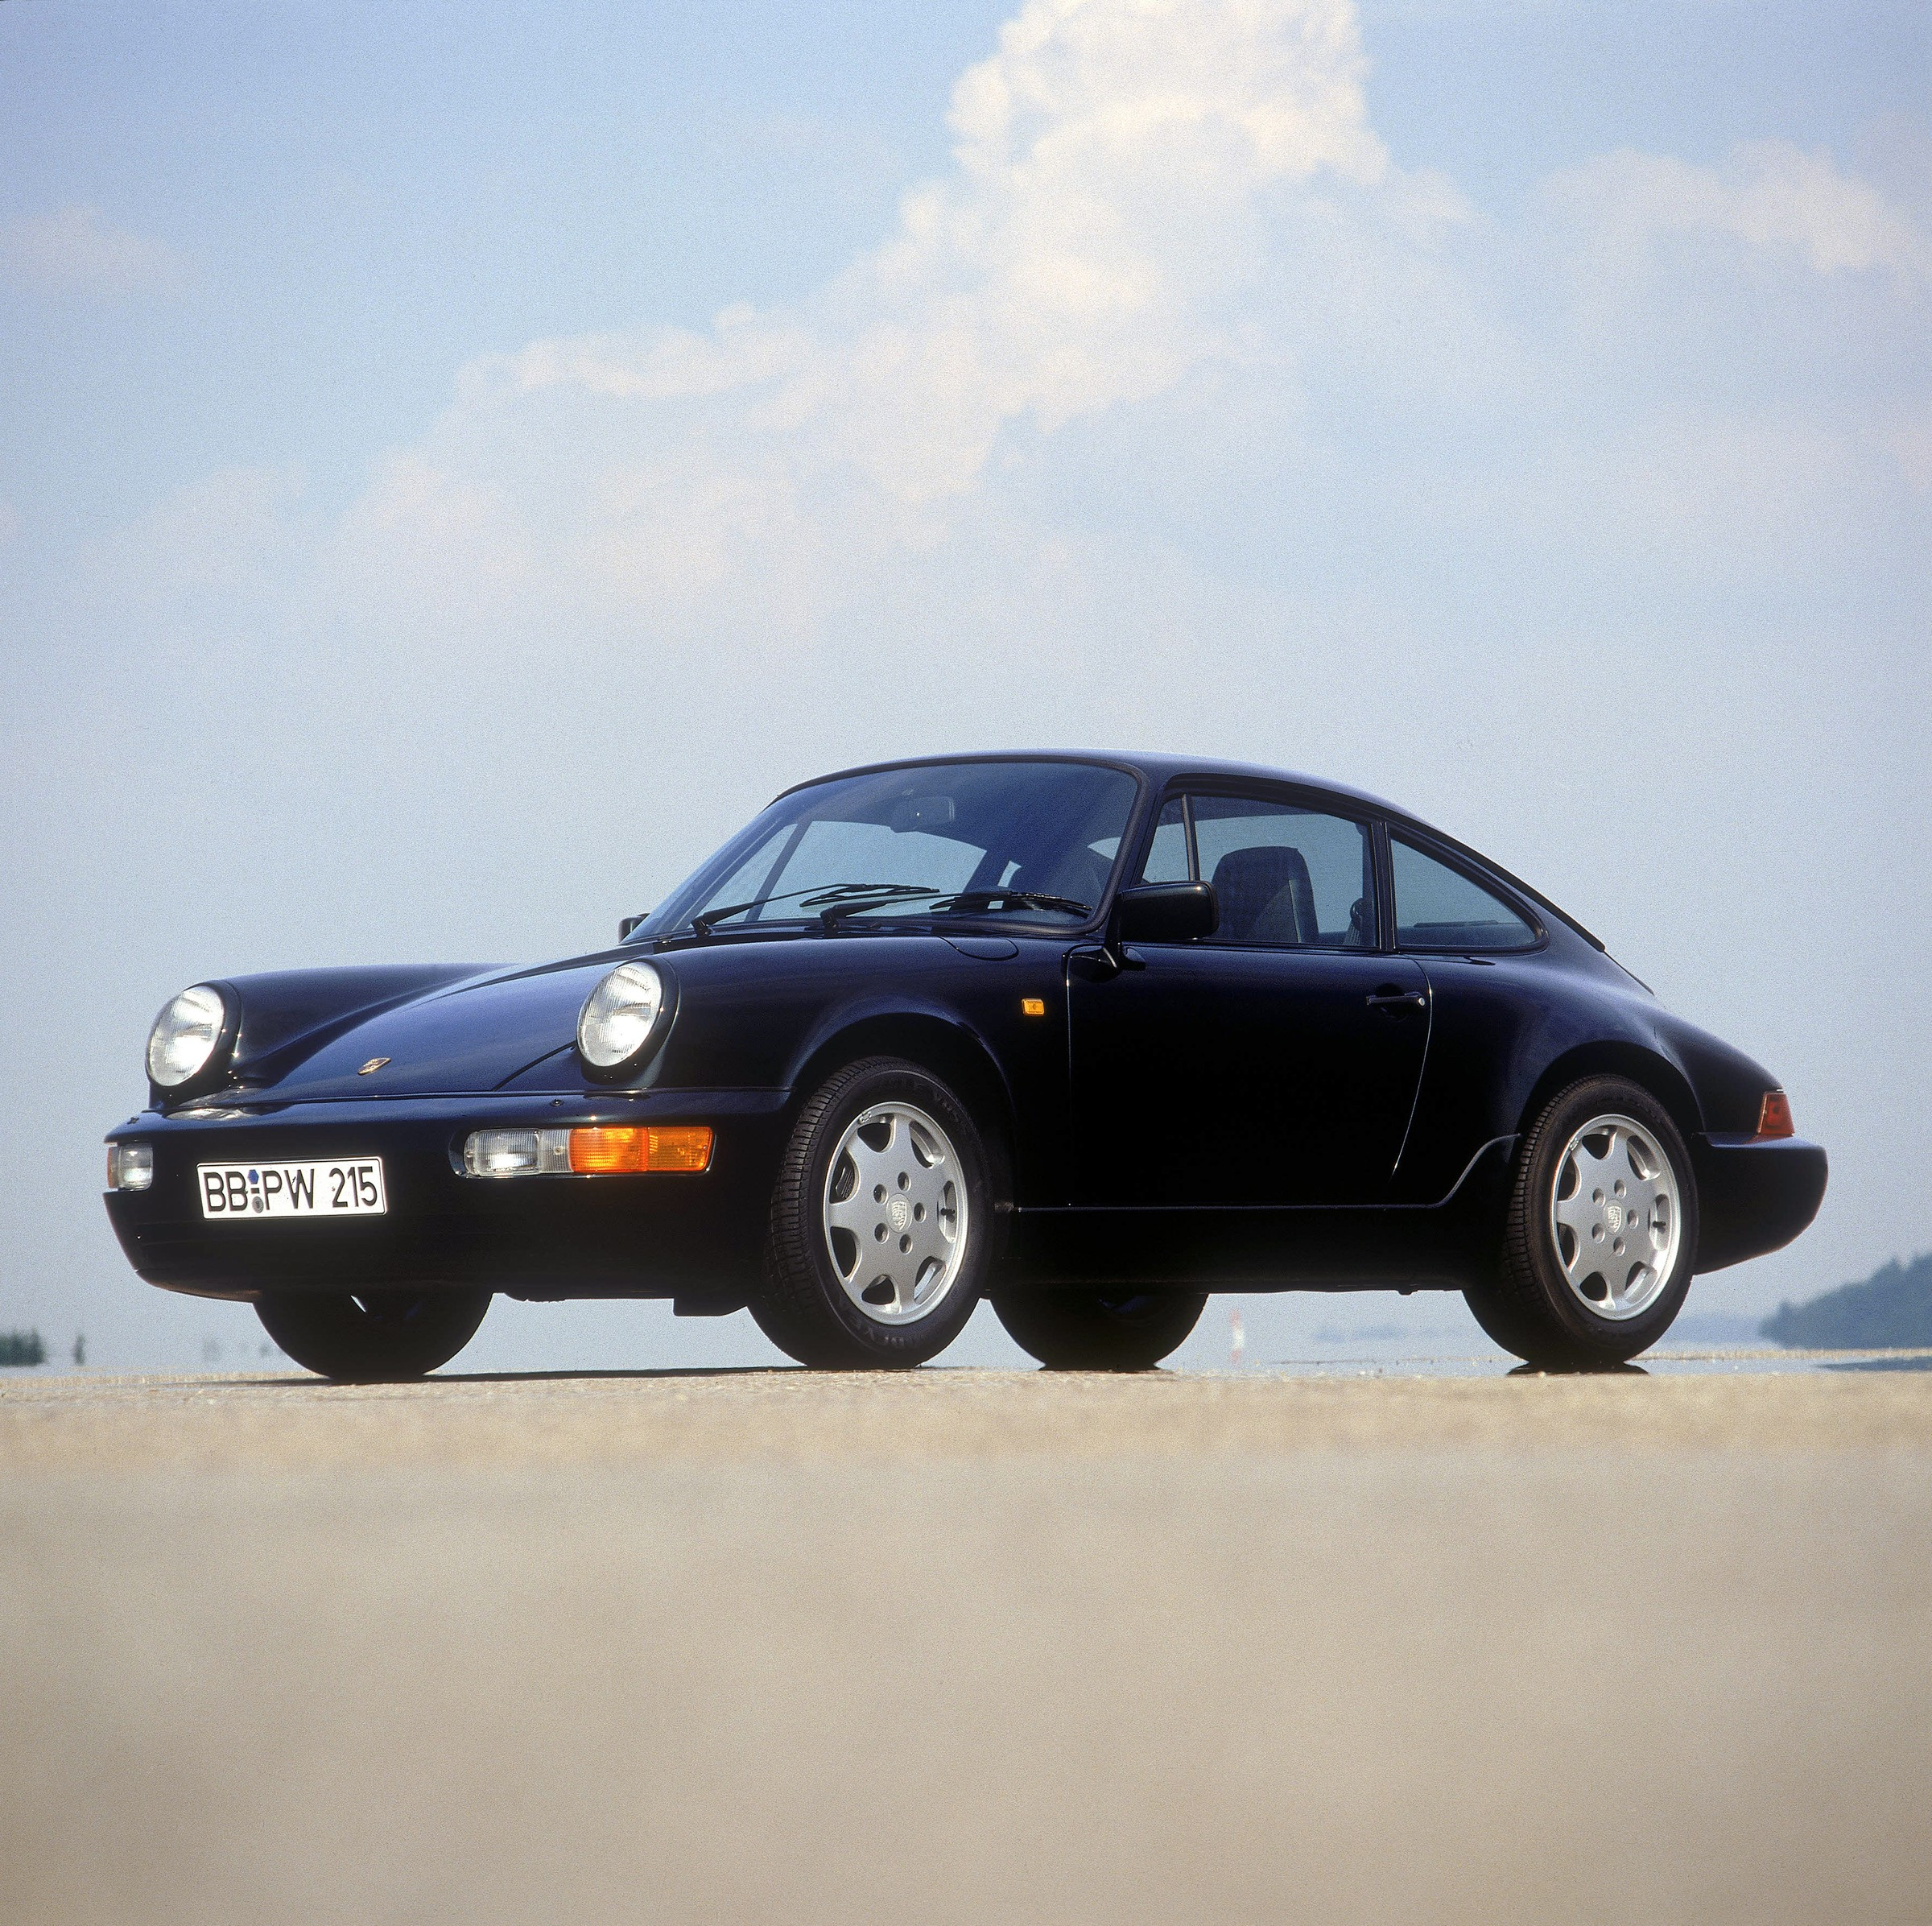 Porsche Carrera: 1988, 1989, 1990, 1991, 1992